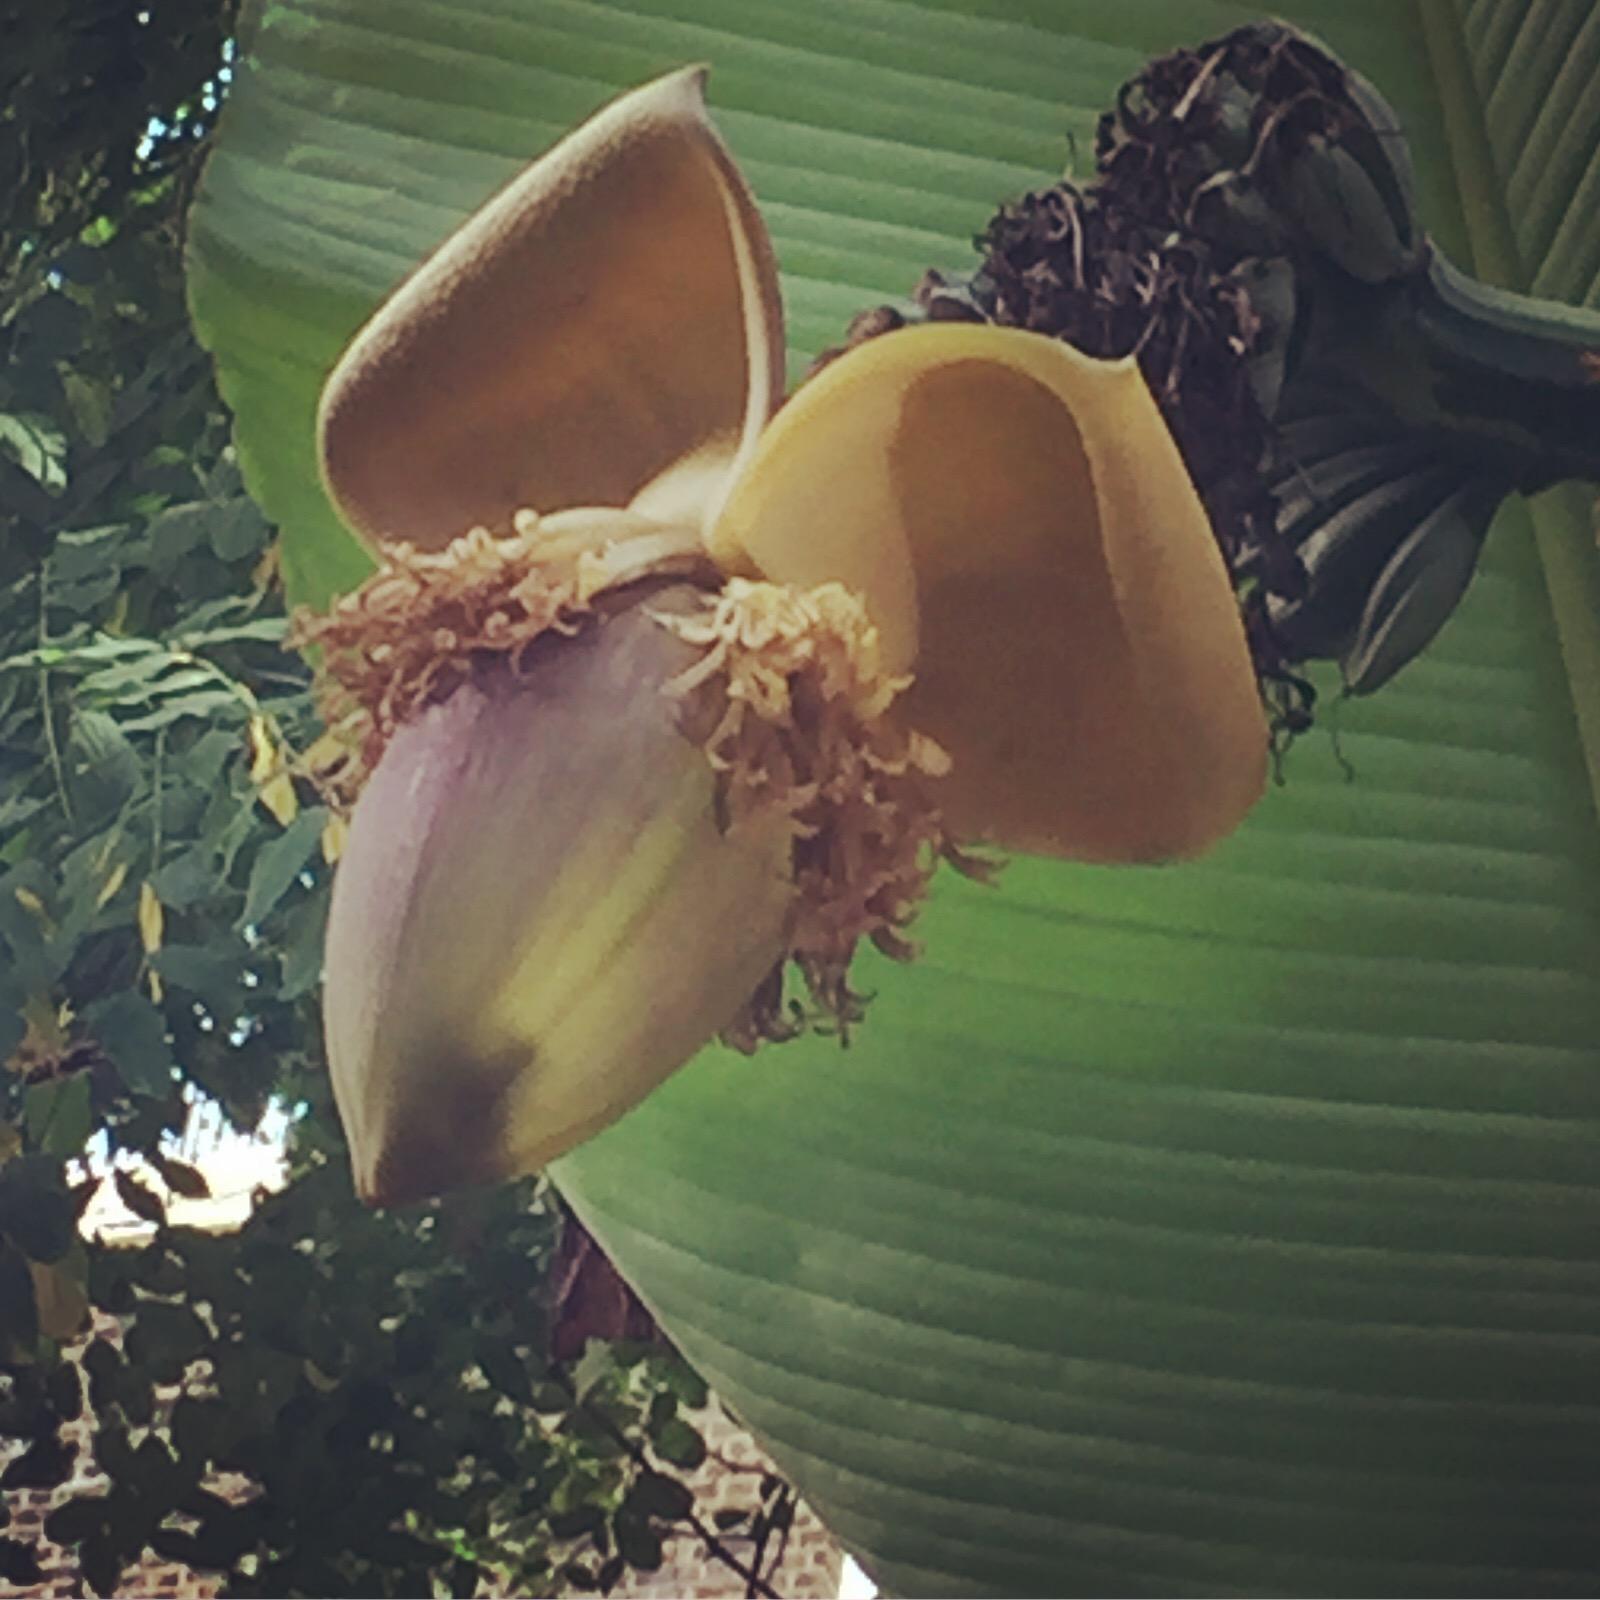 UK bananas